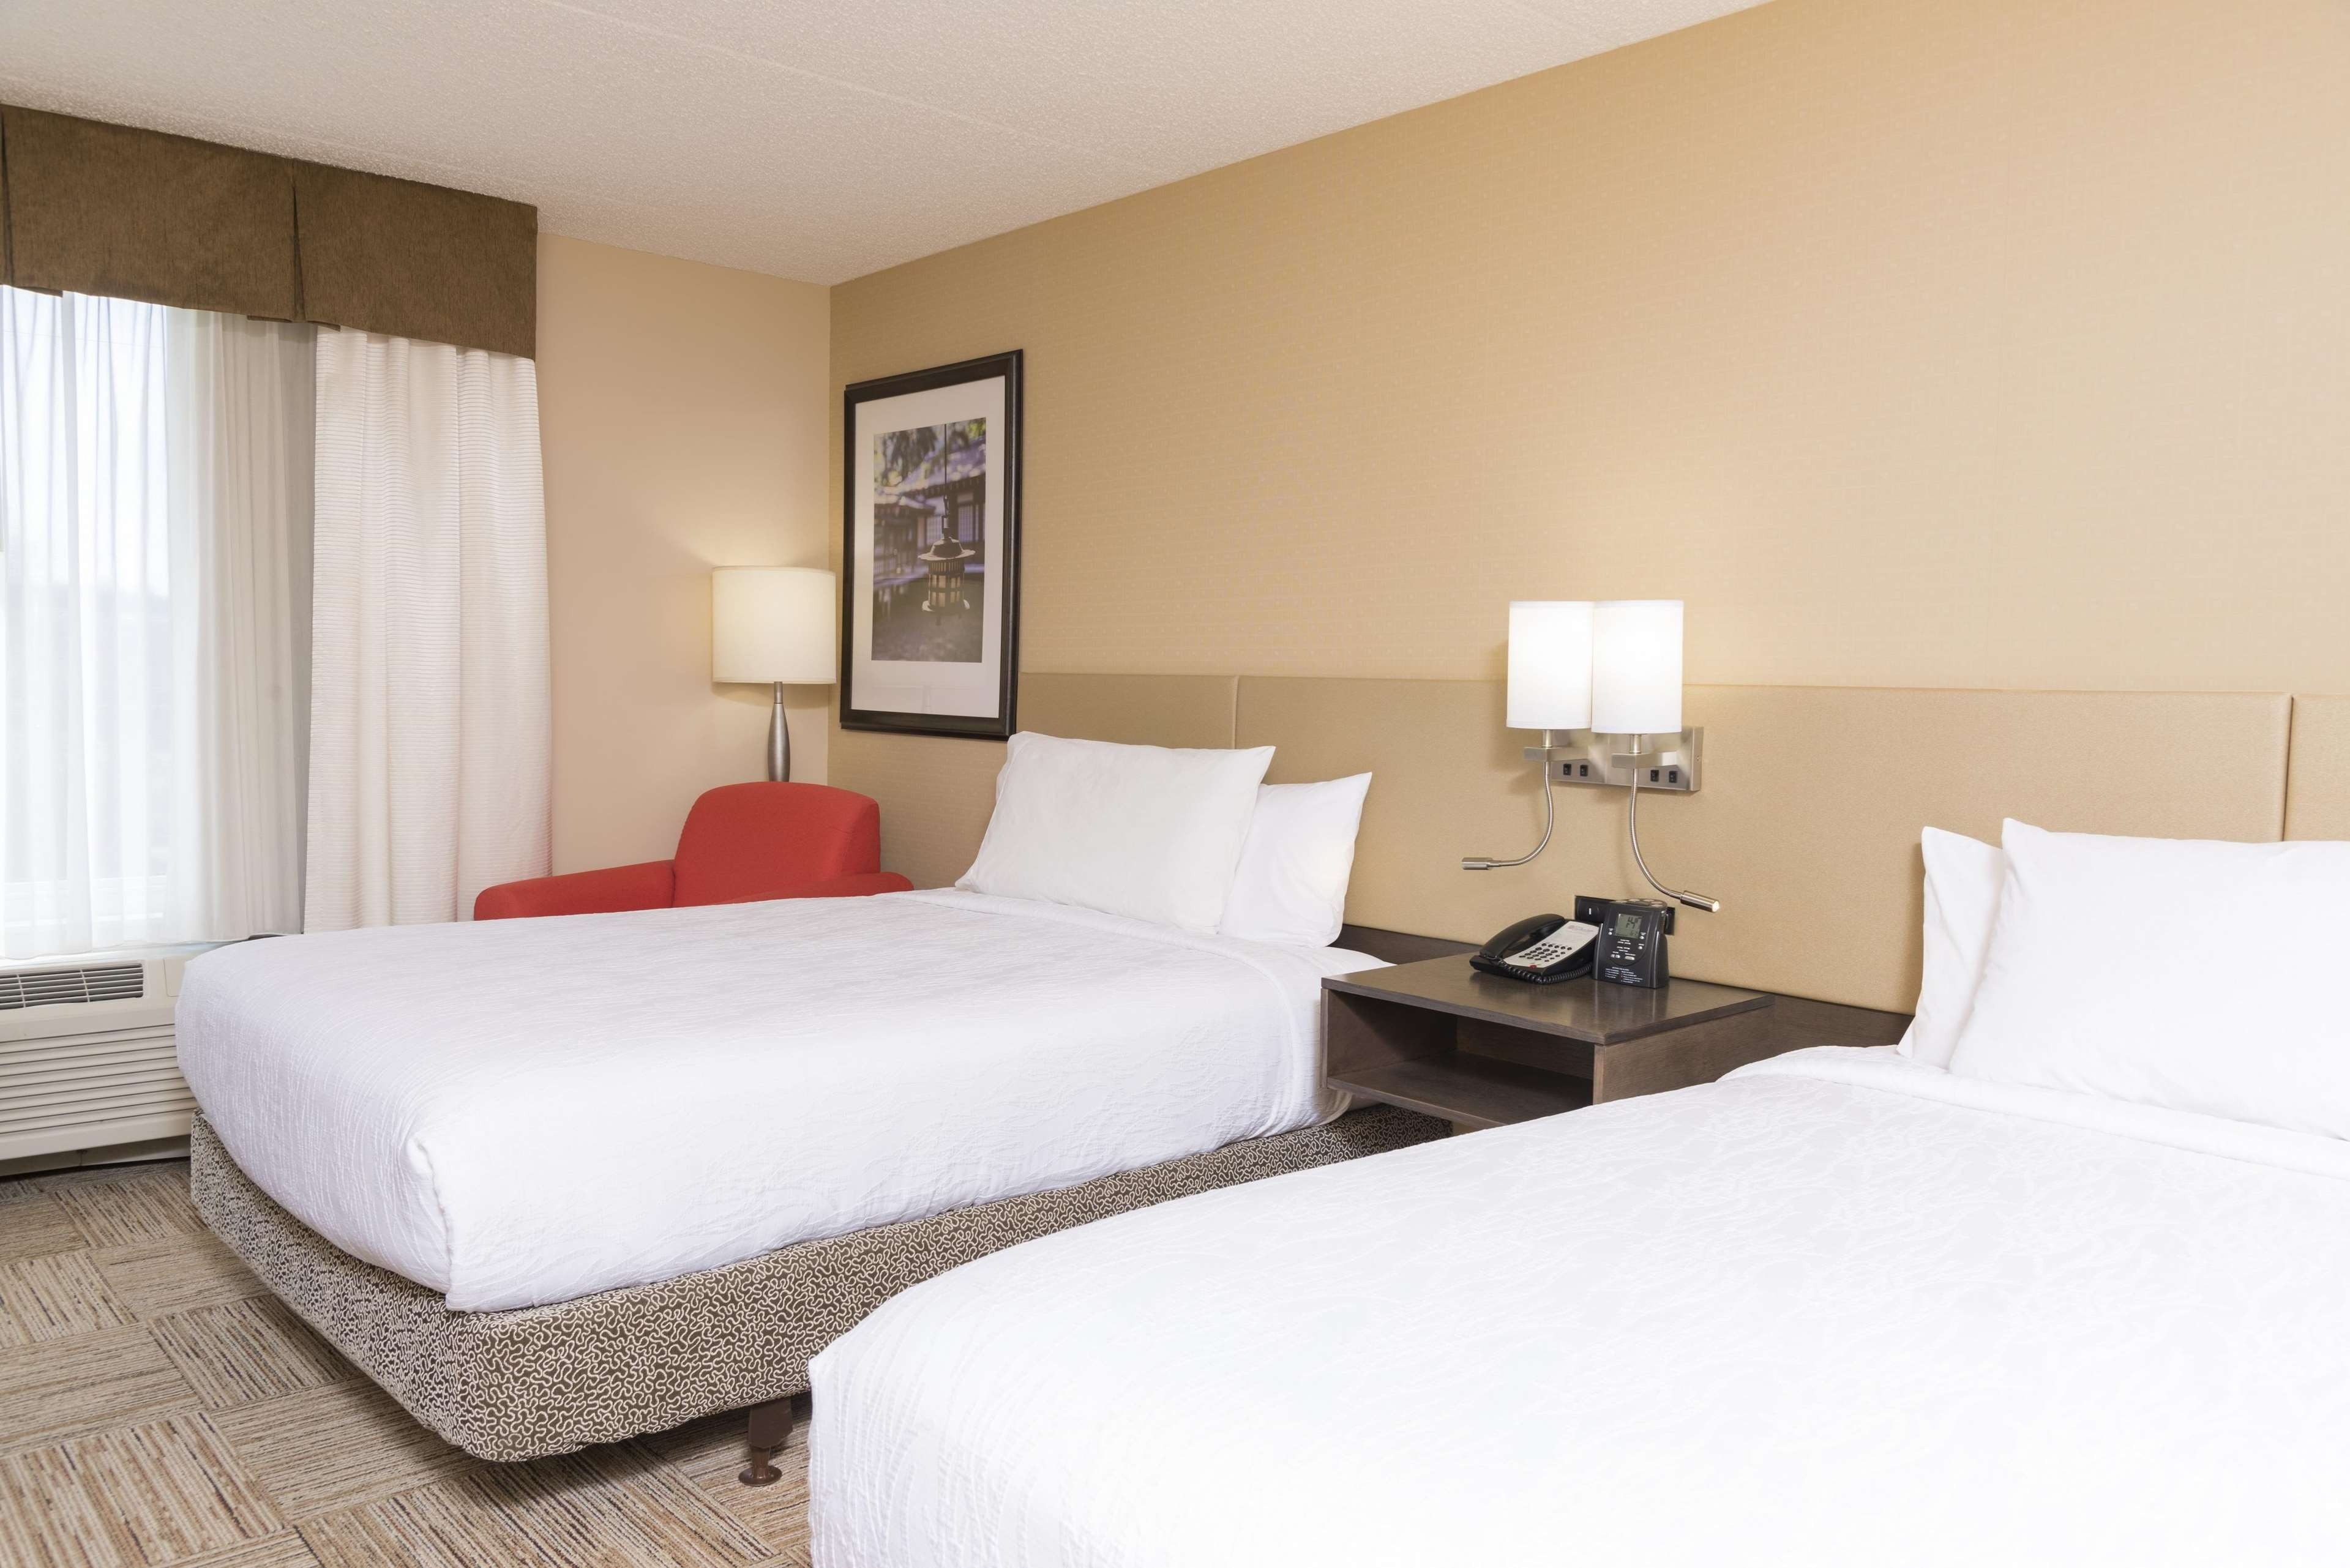 Hilton Garden Inn West Lafayette Wabash Landing image 13